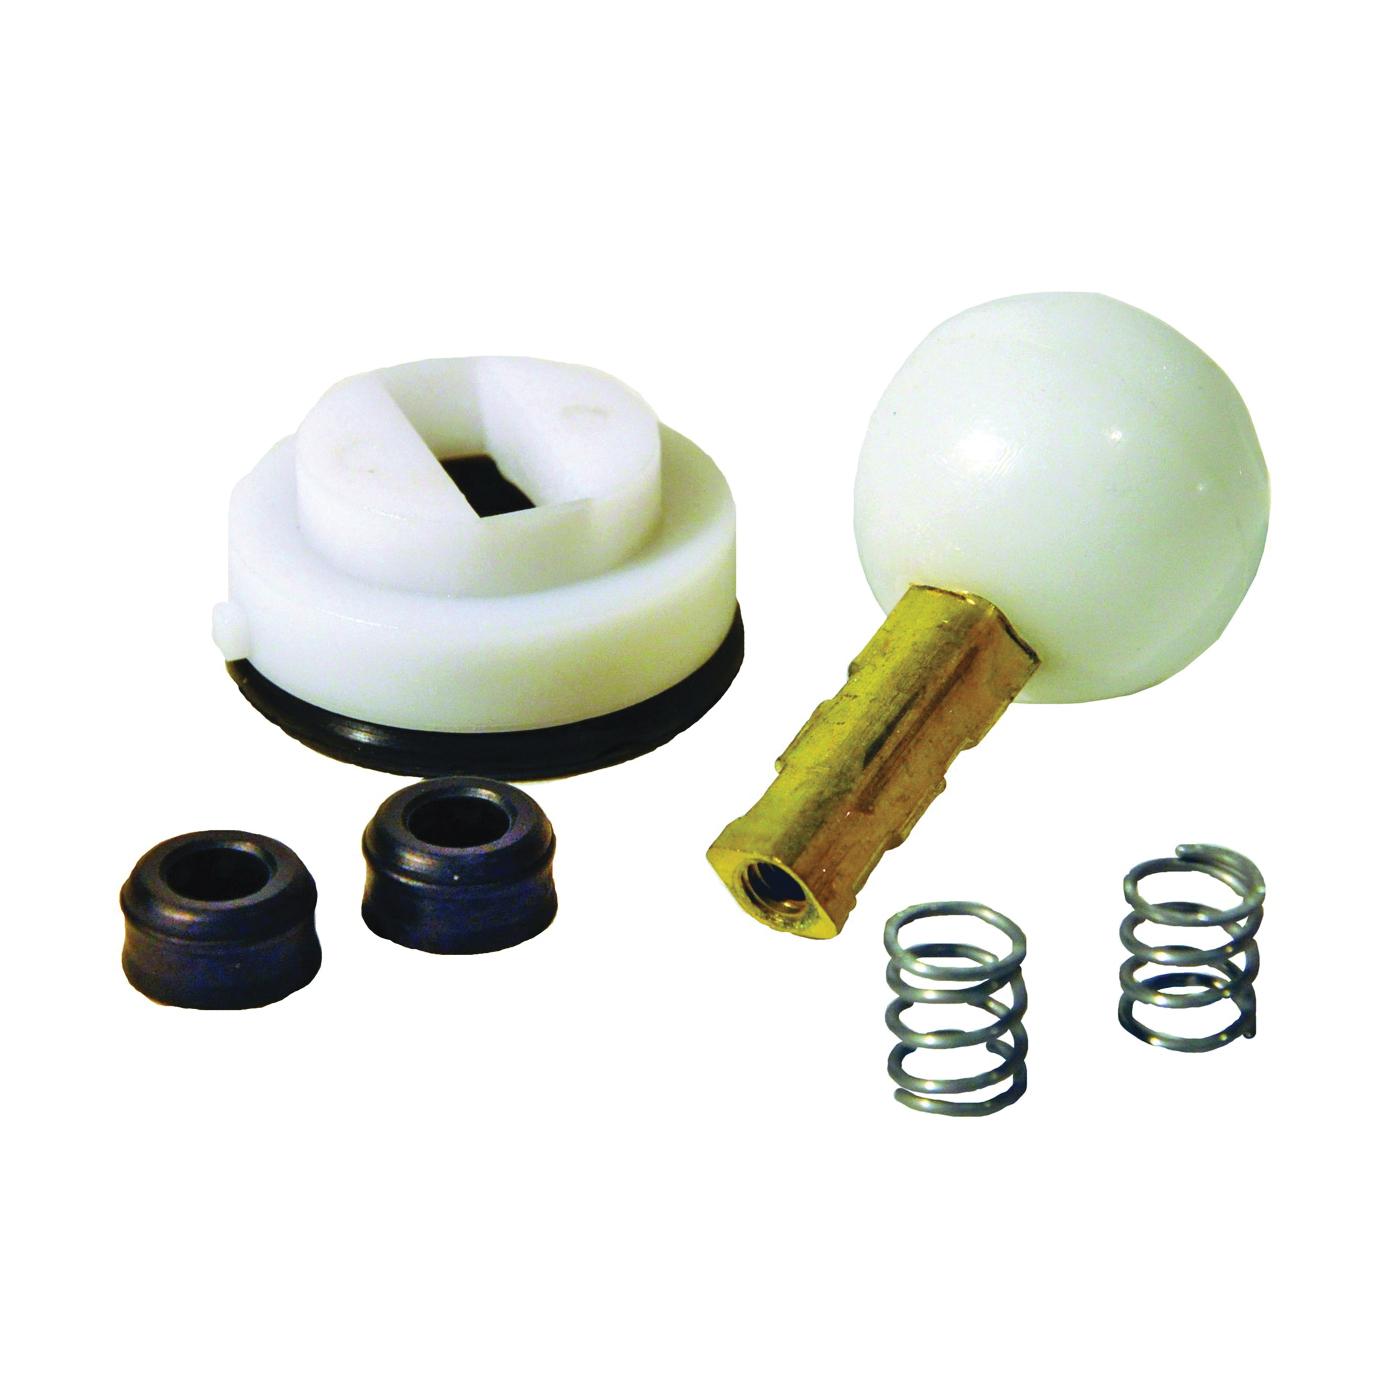 Picture of Danco PR-9B Series 80743 Cartridge Repair Kit, Brass/Plastic/Rubber/Steel